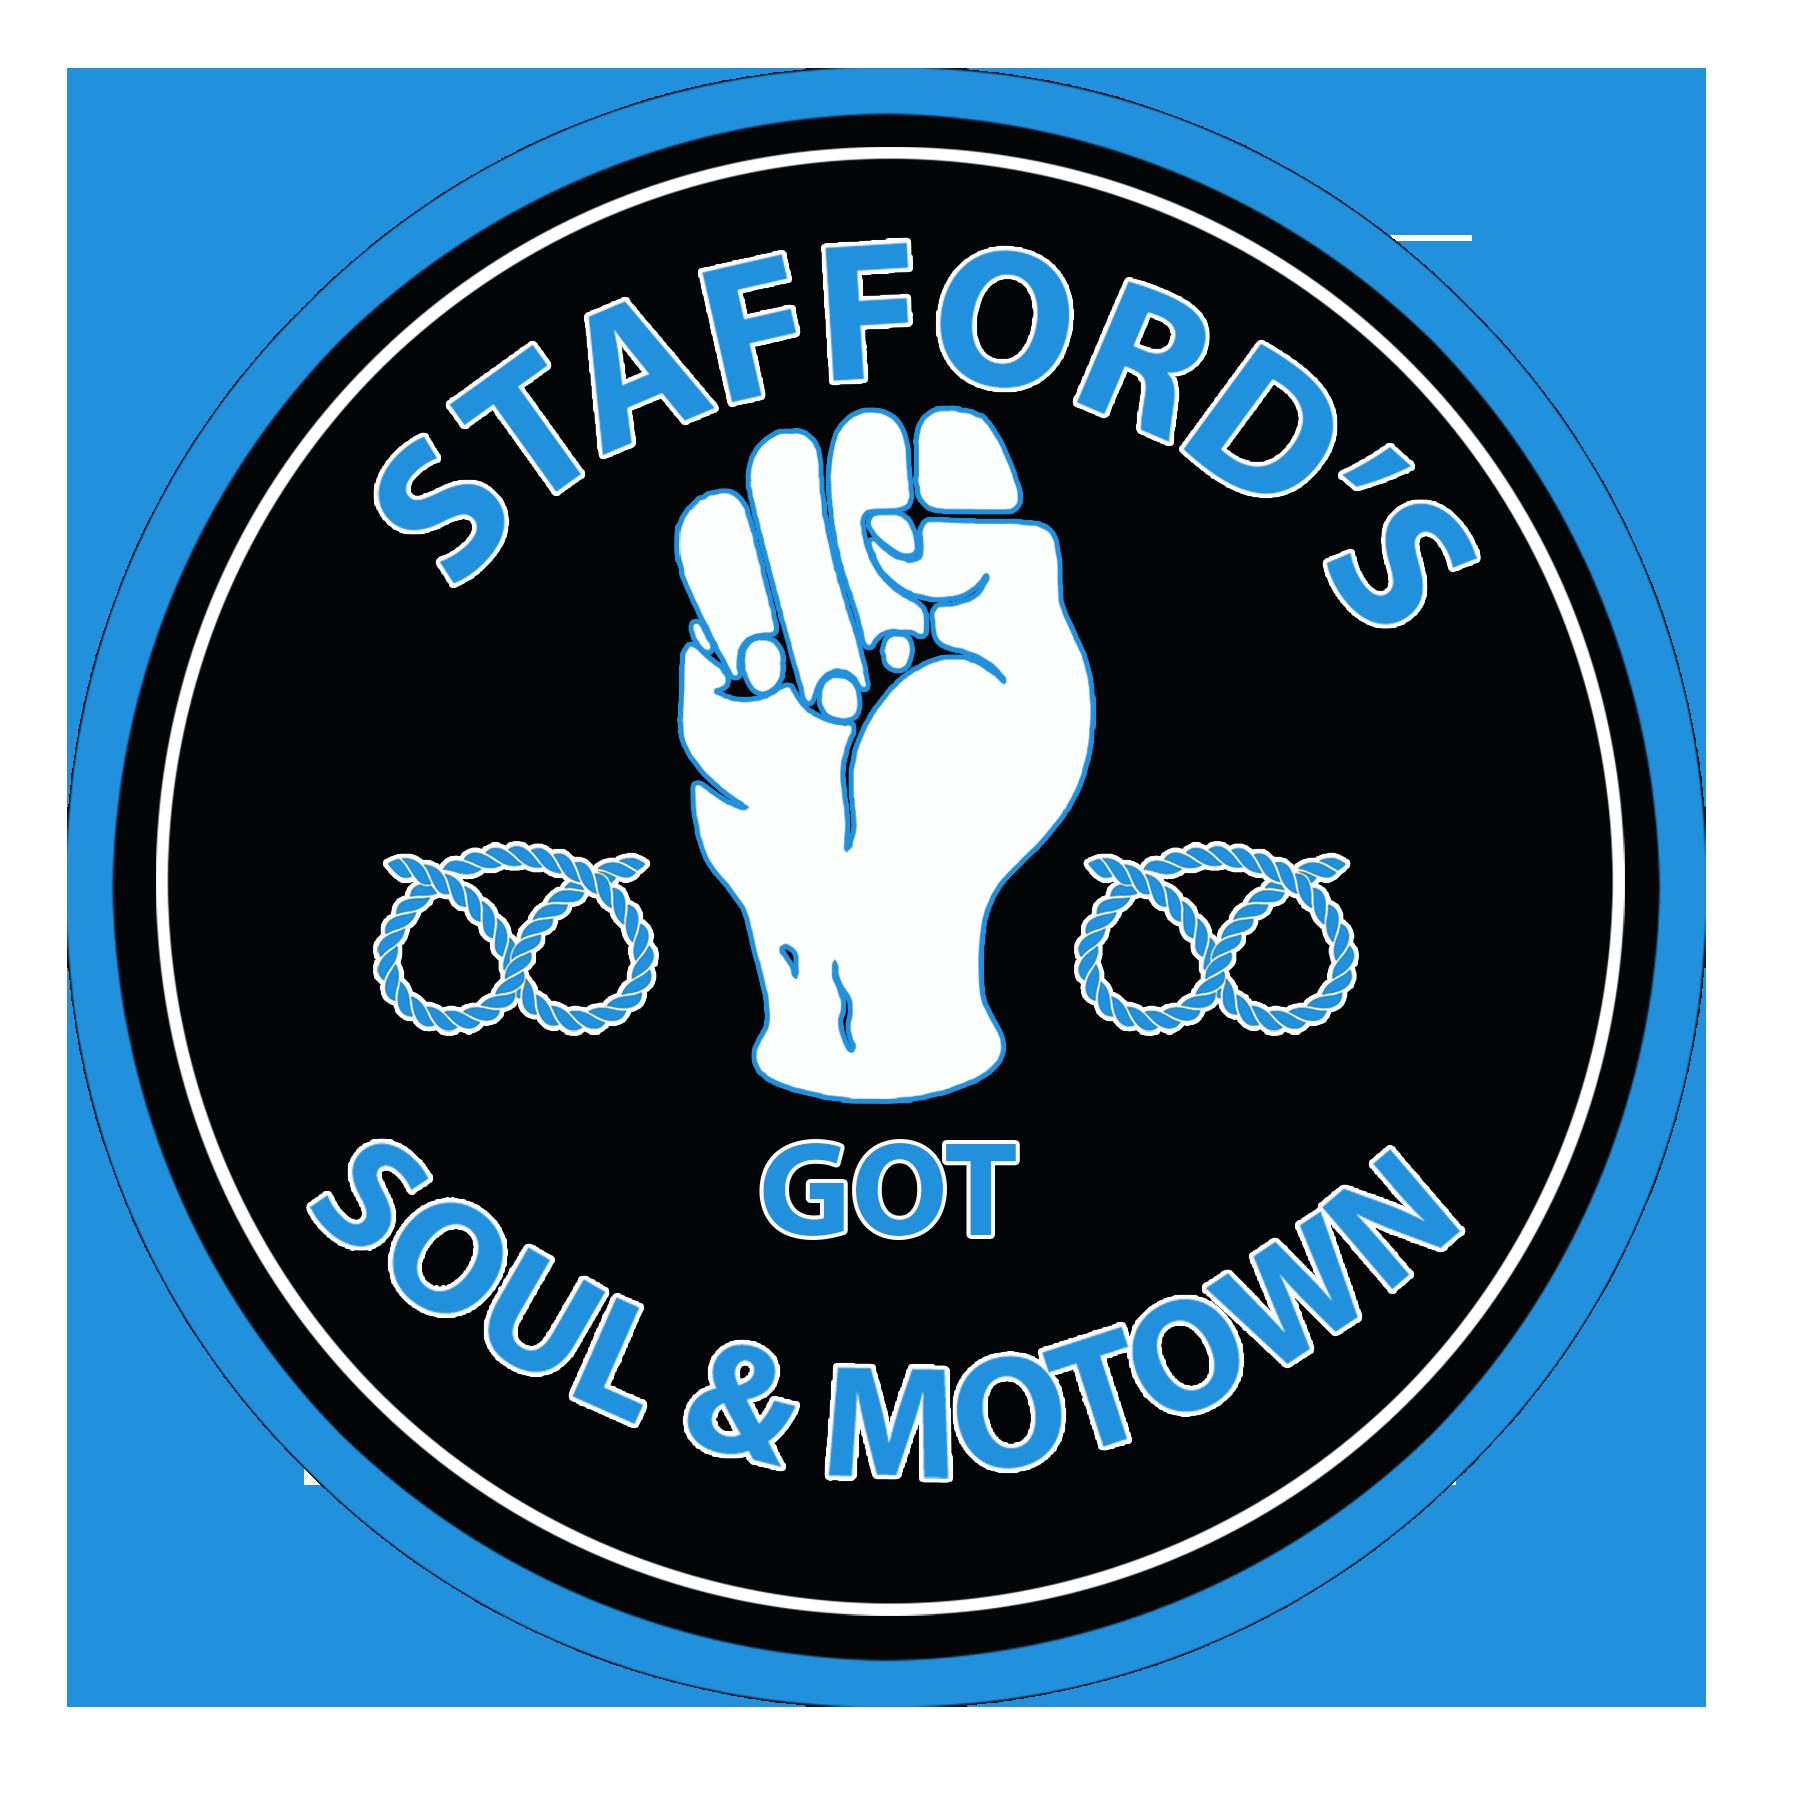 Staffords Got Soul  Motown flyer